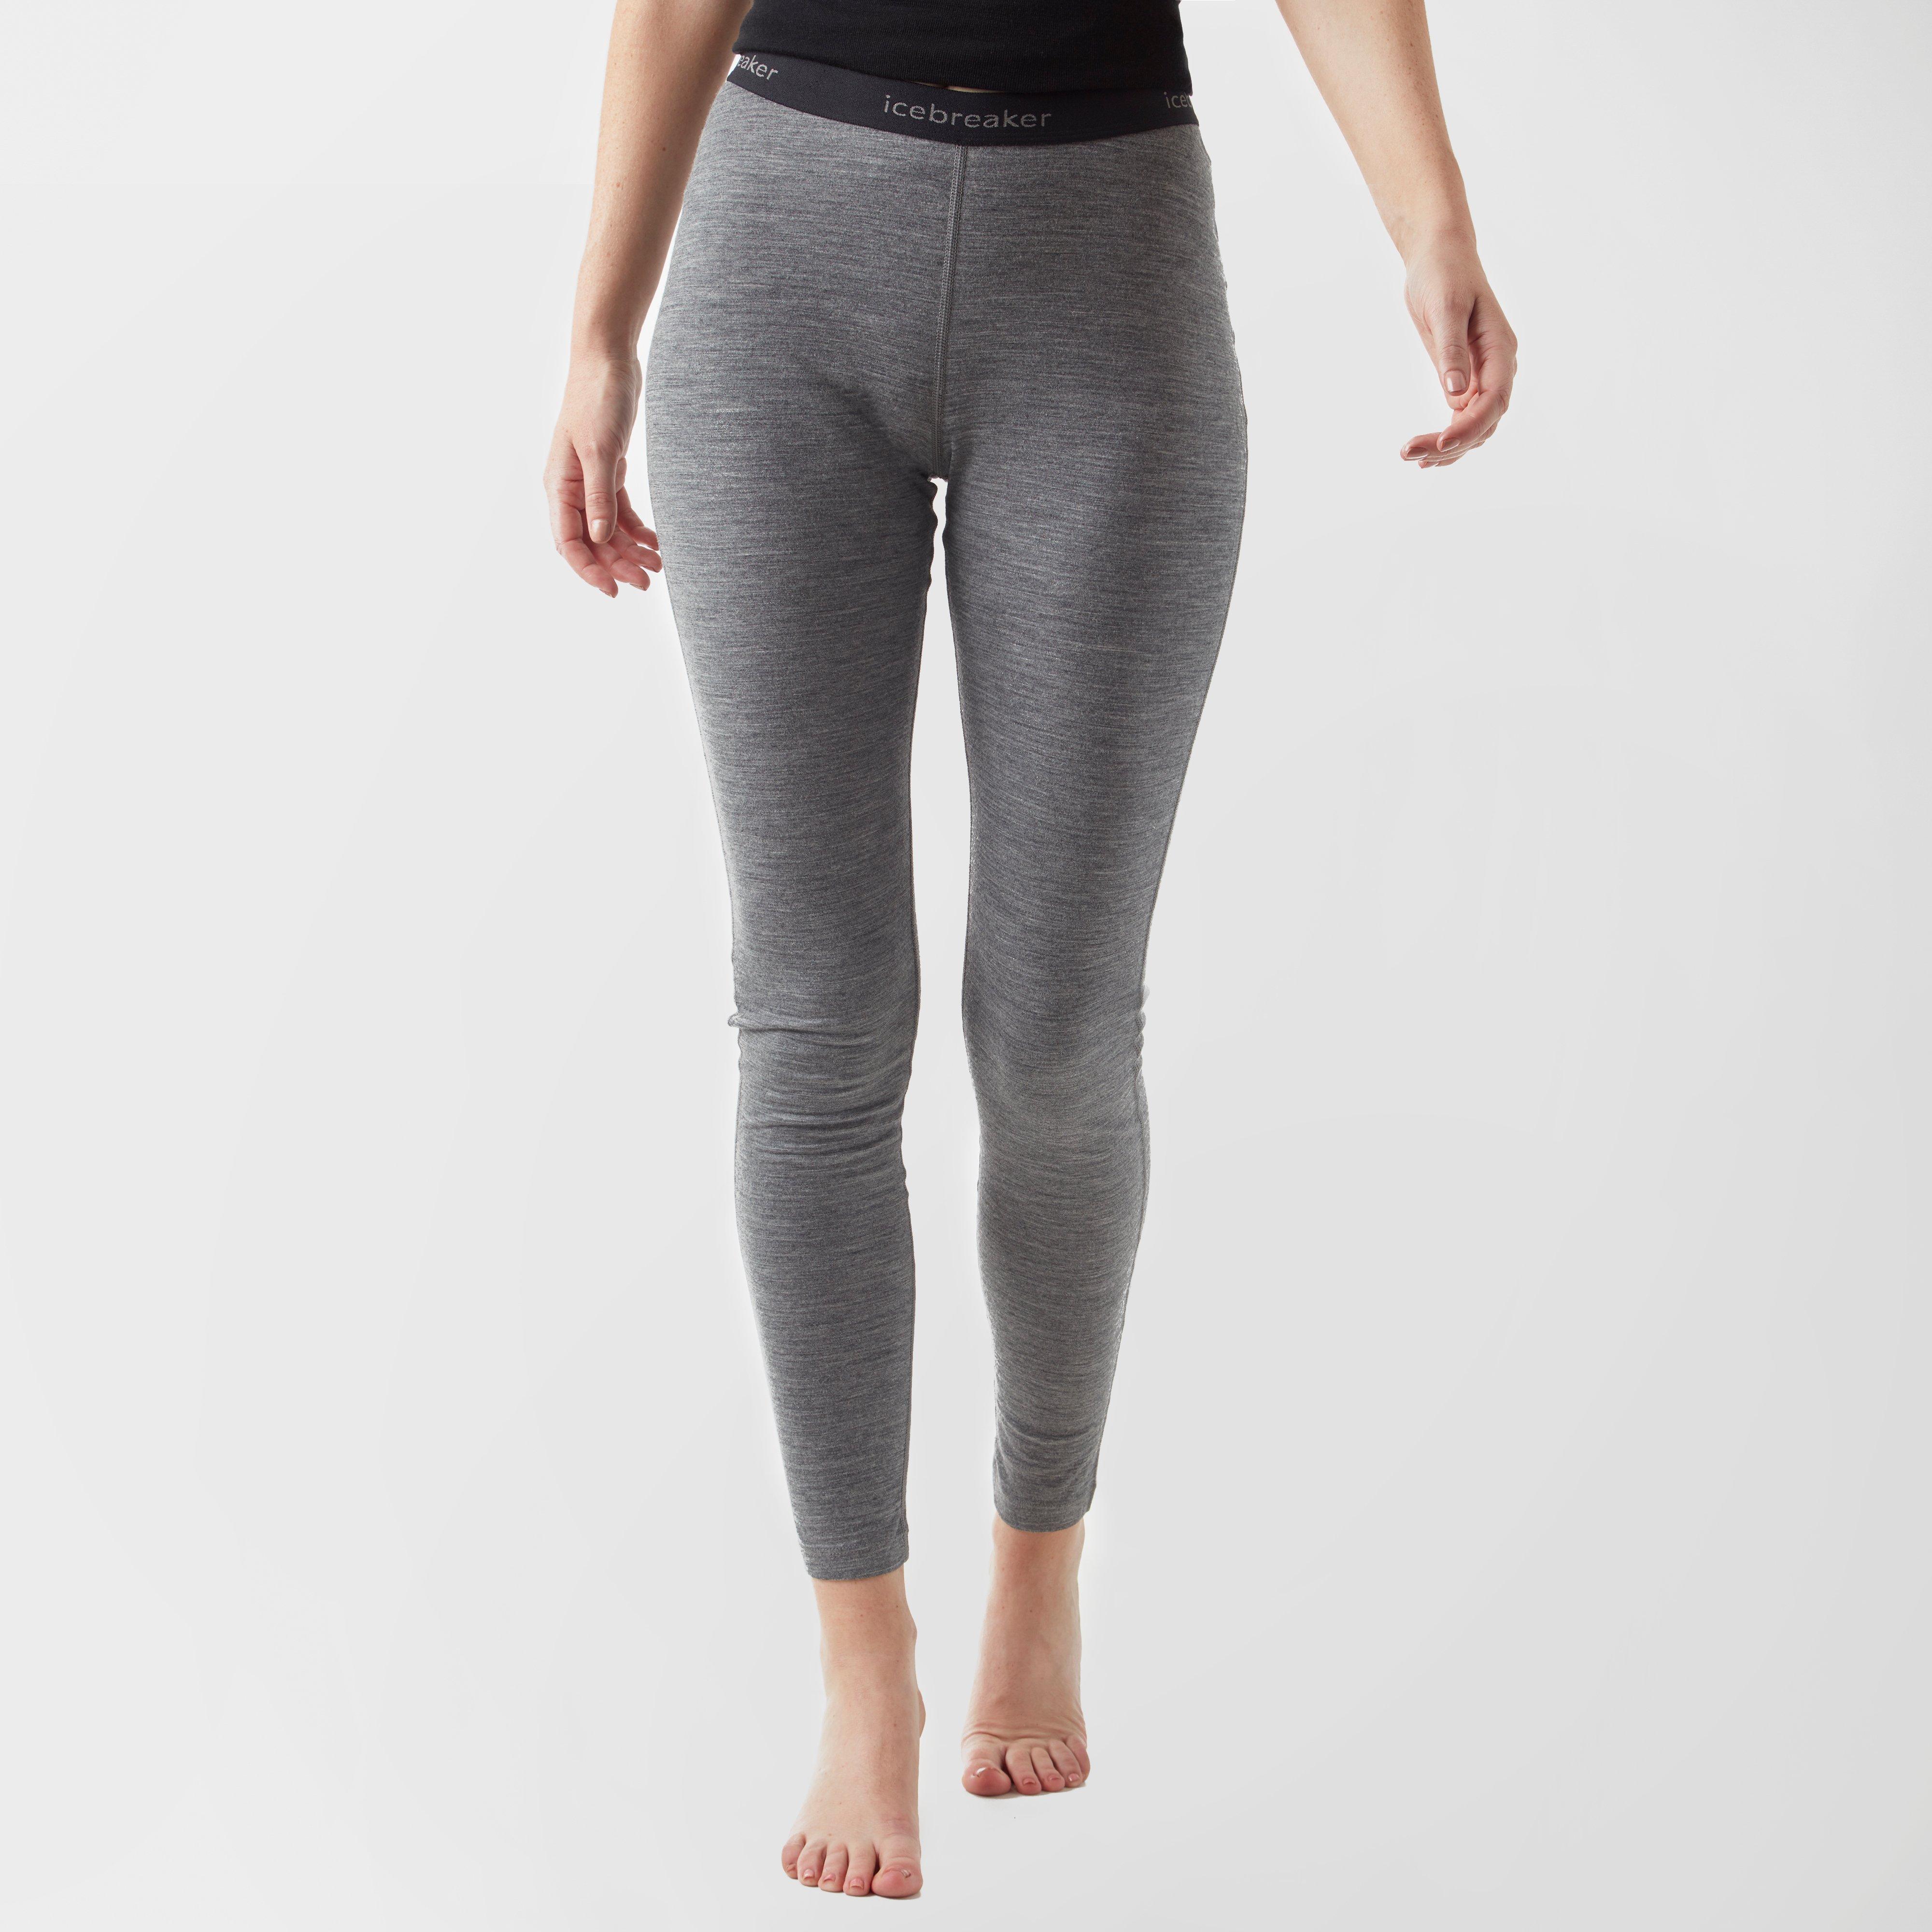 Icebreaker Icebreaker womens Oasis Legging - Grey, Grey